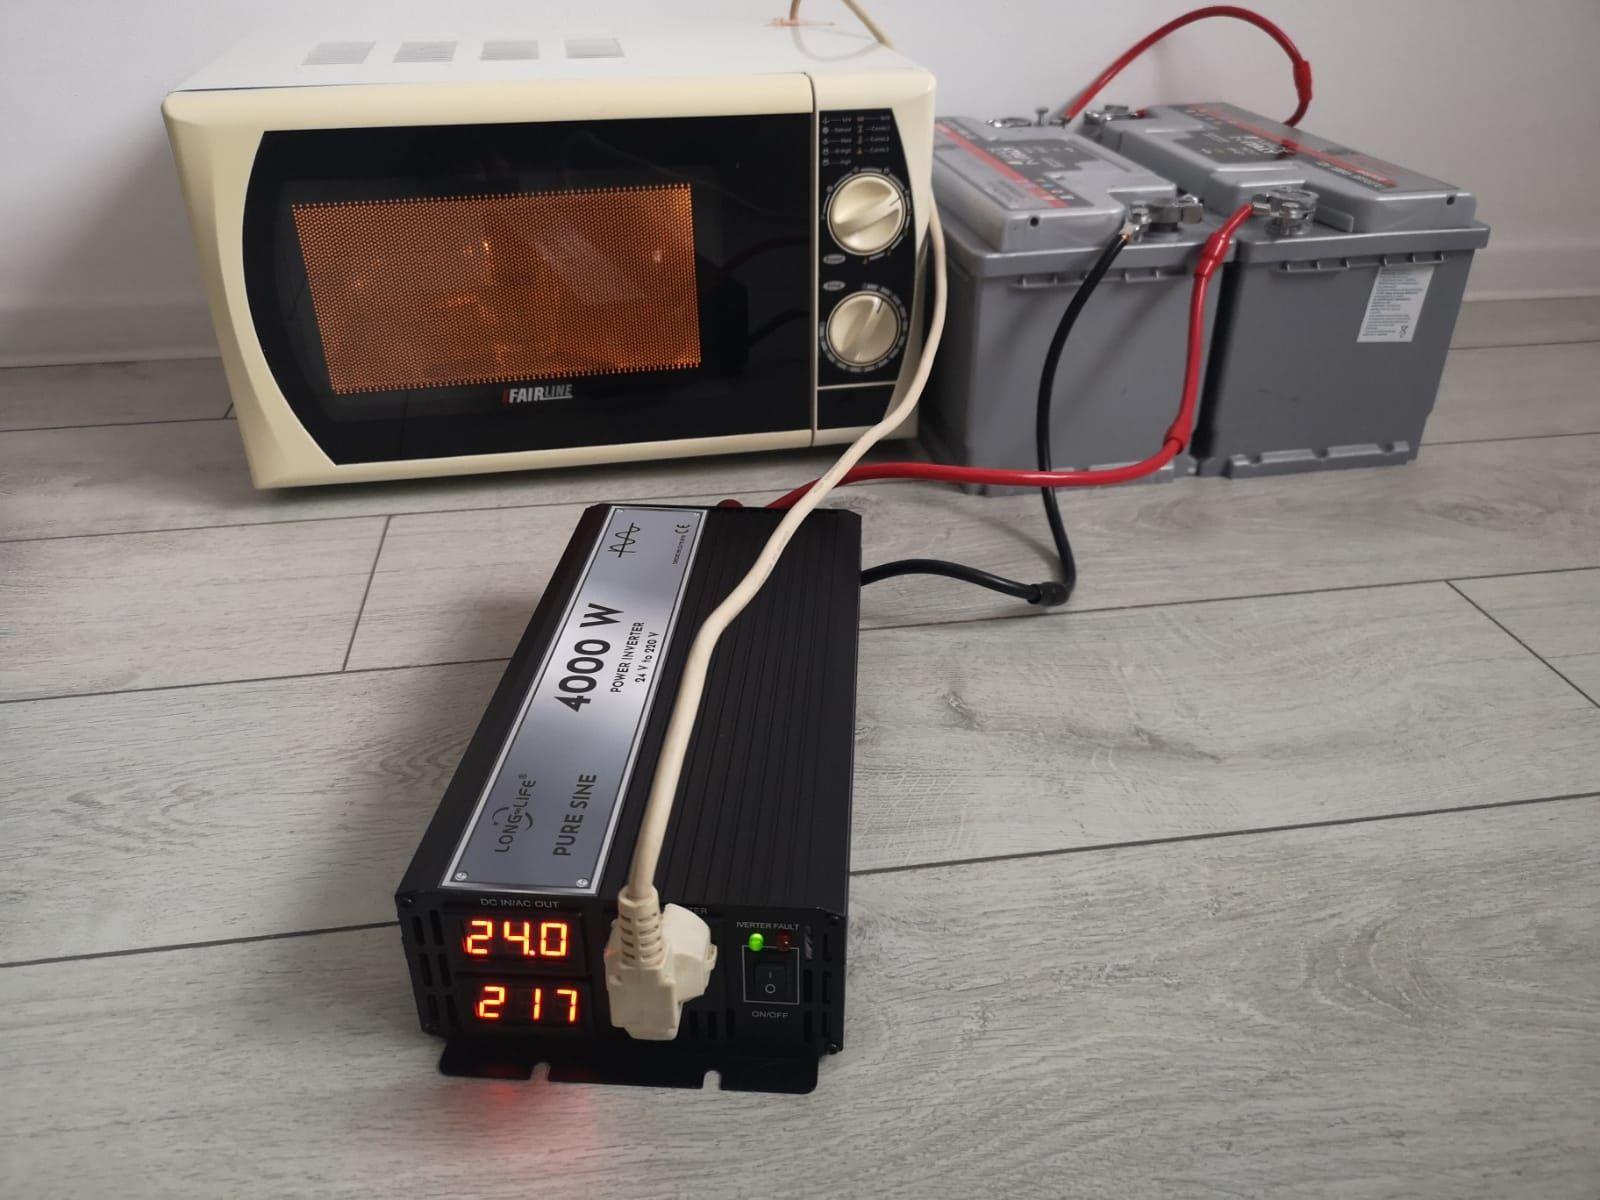 INVERTOR unda pura 24 V-220V, SINUS PUR, tir, duce orice electrocasnic